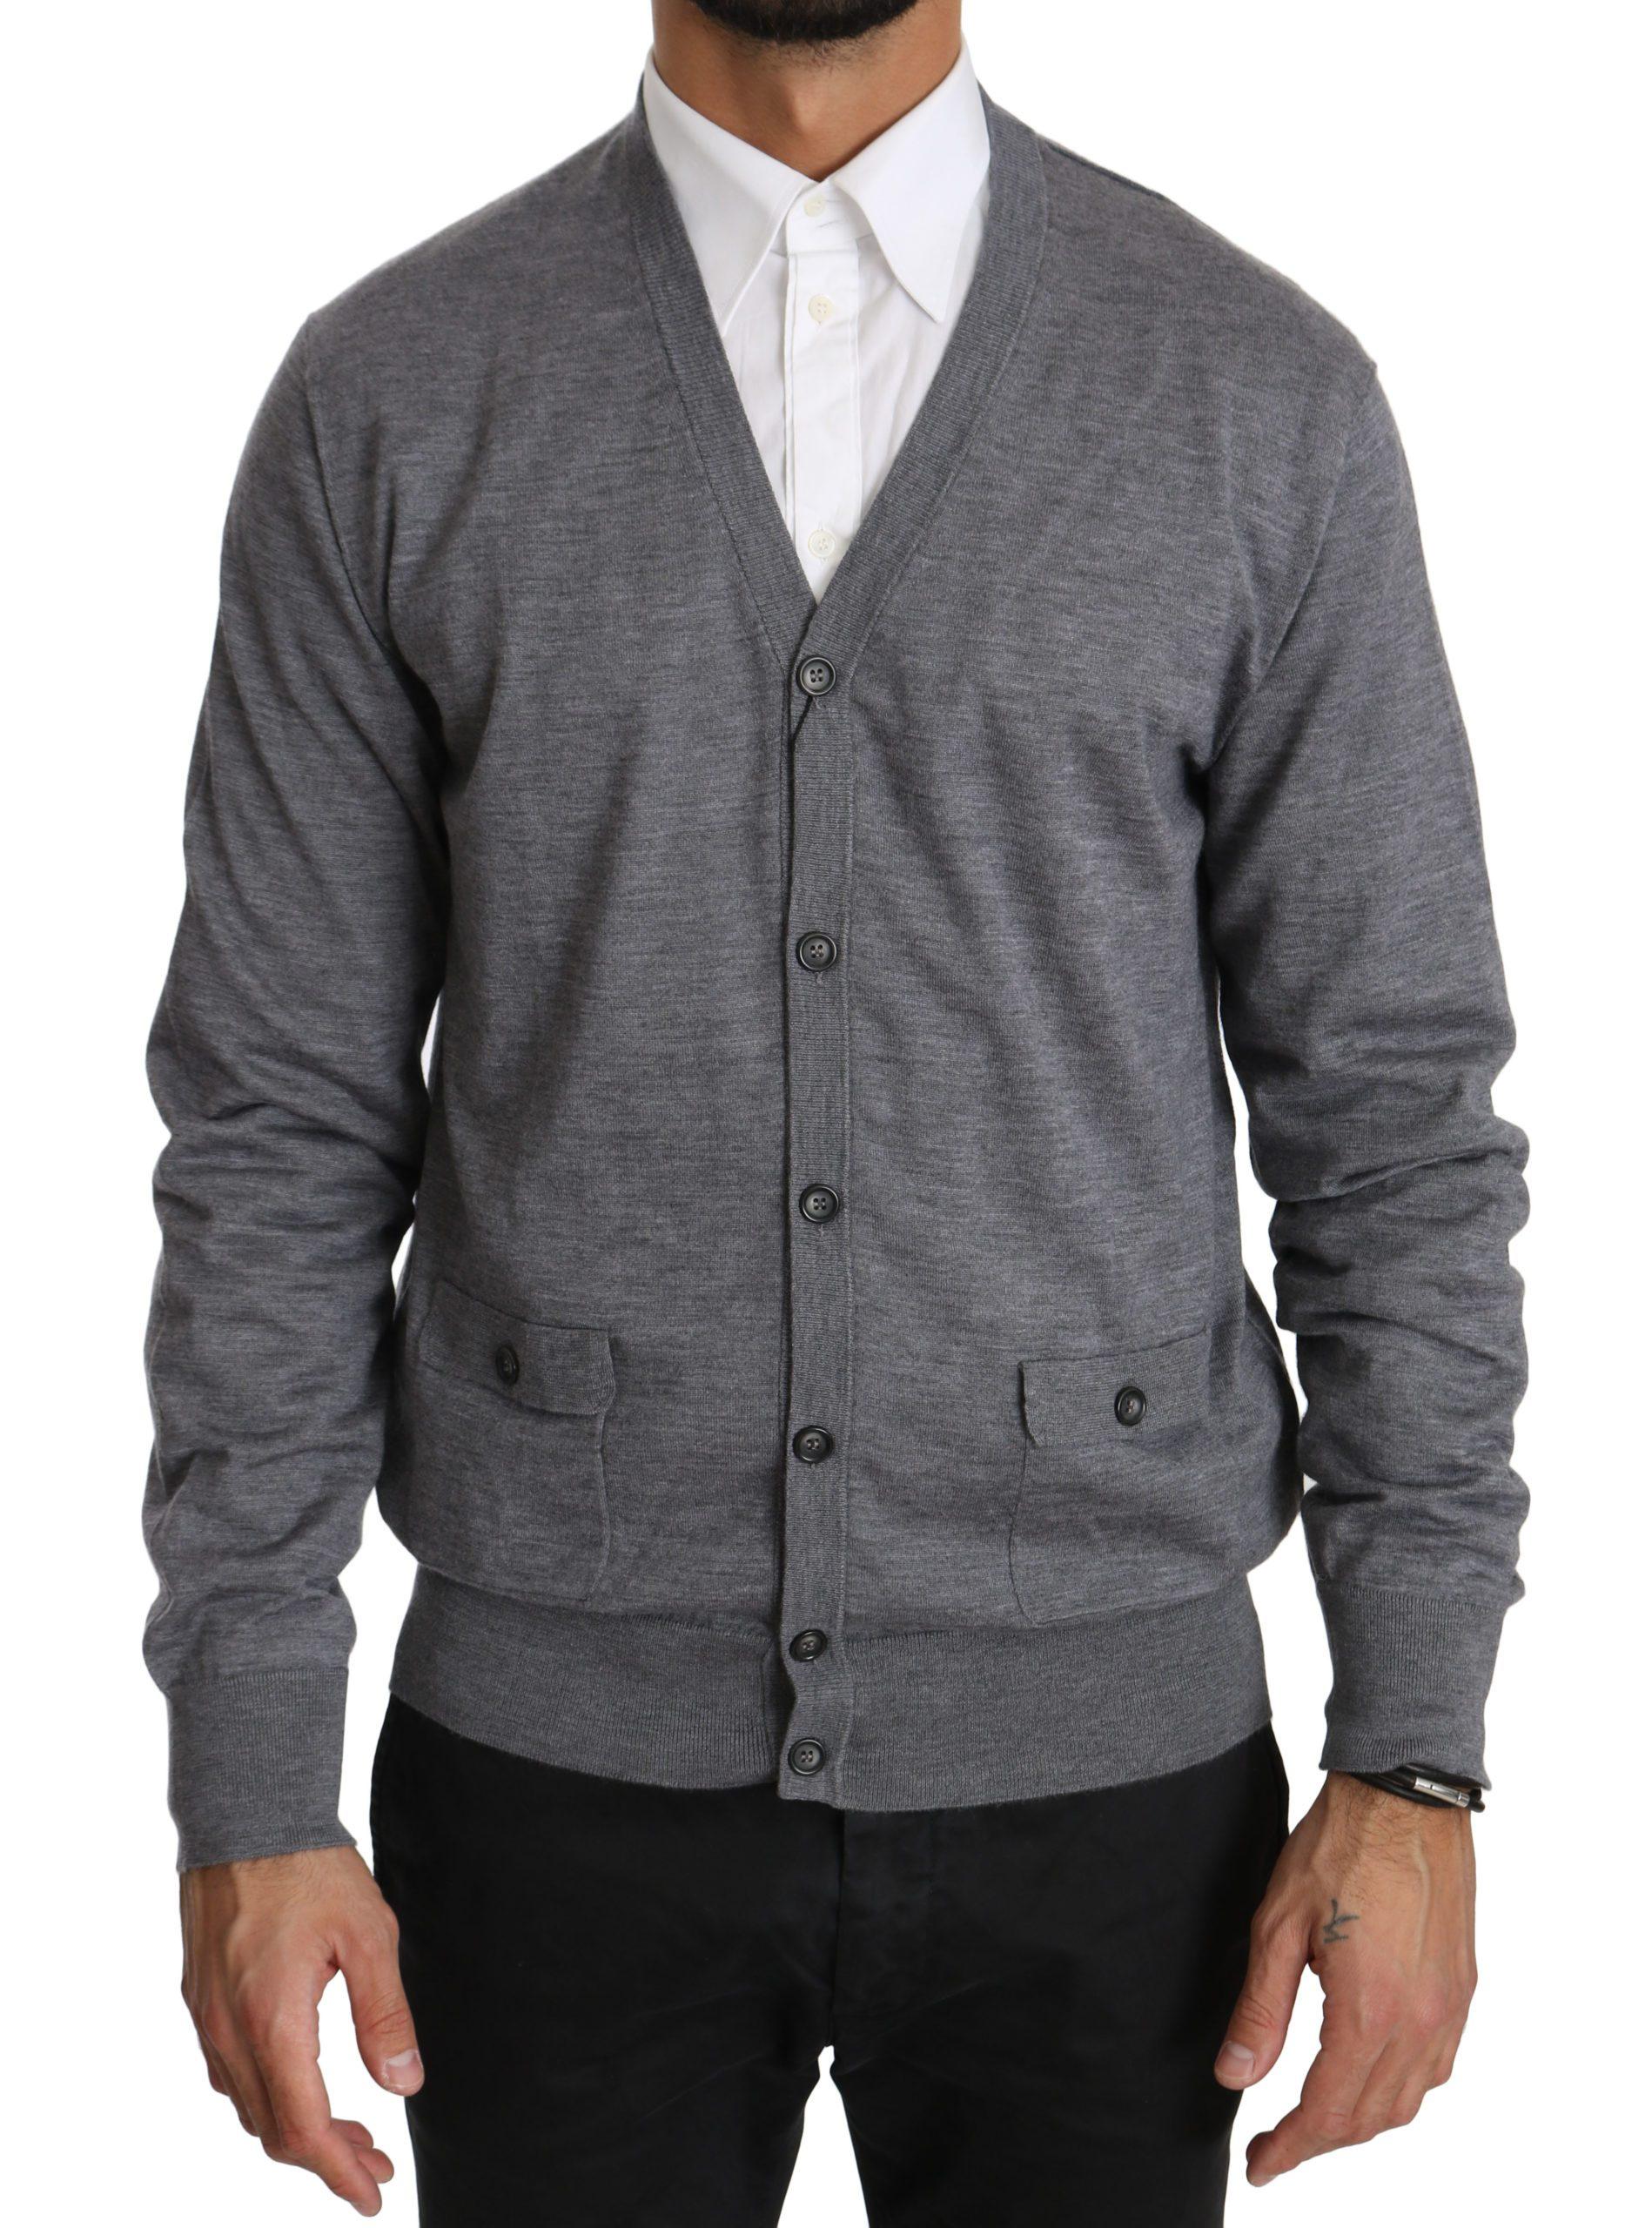 Dolce & Gabbana Men's Cashmere Button Down Cardigan Gray TSH4030 - IT50 | L